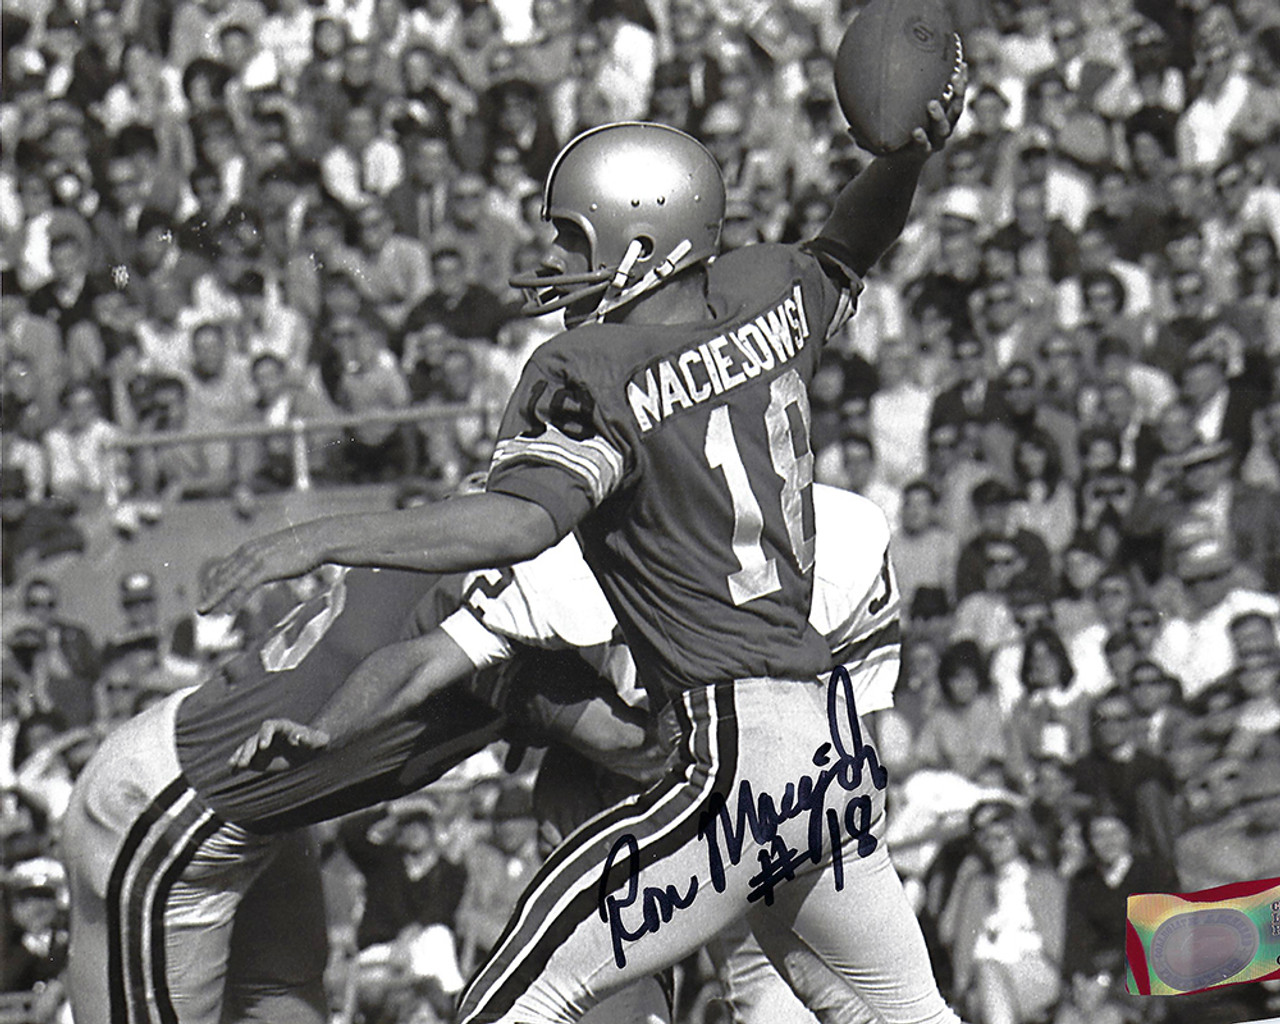 Ron Maciejowski 8-3  8x10 Autographed Photo - Certified Authentic